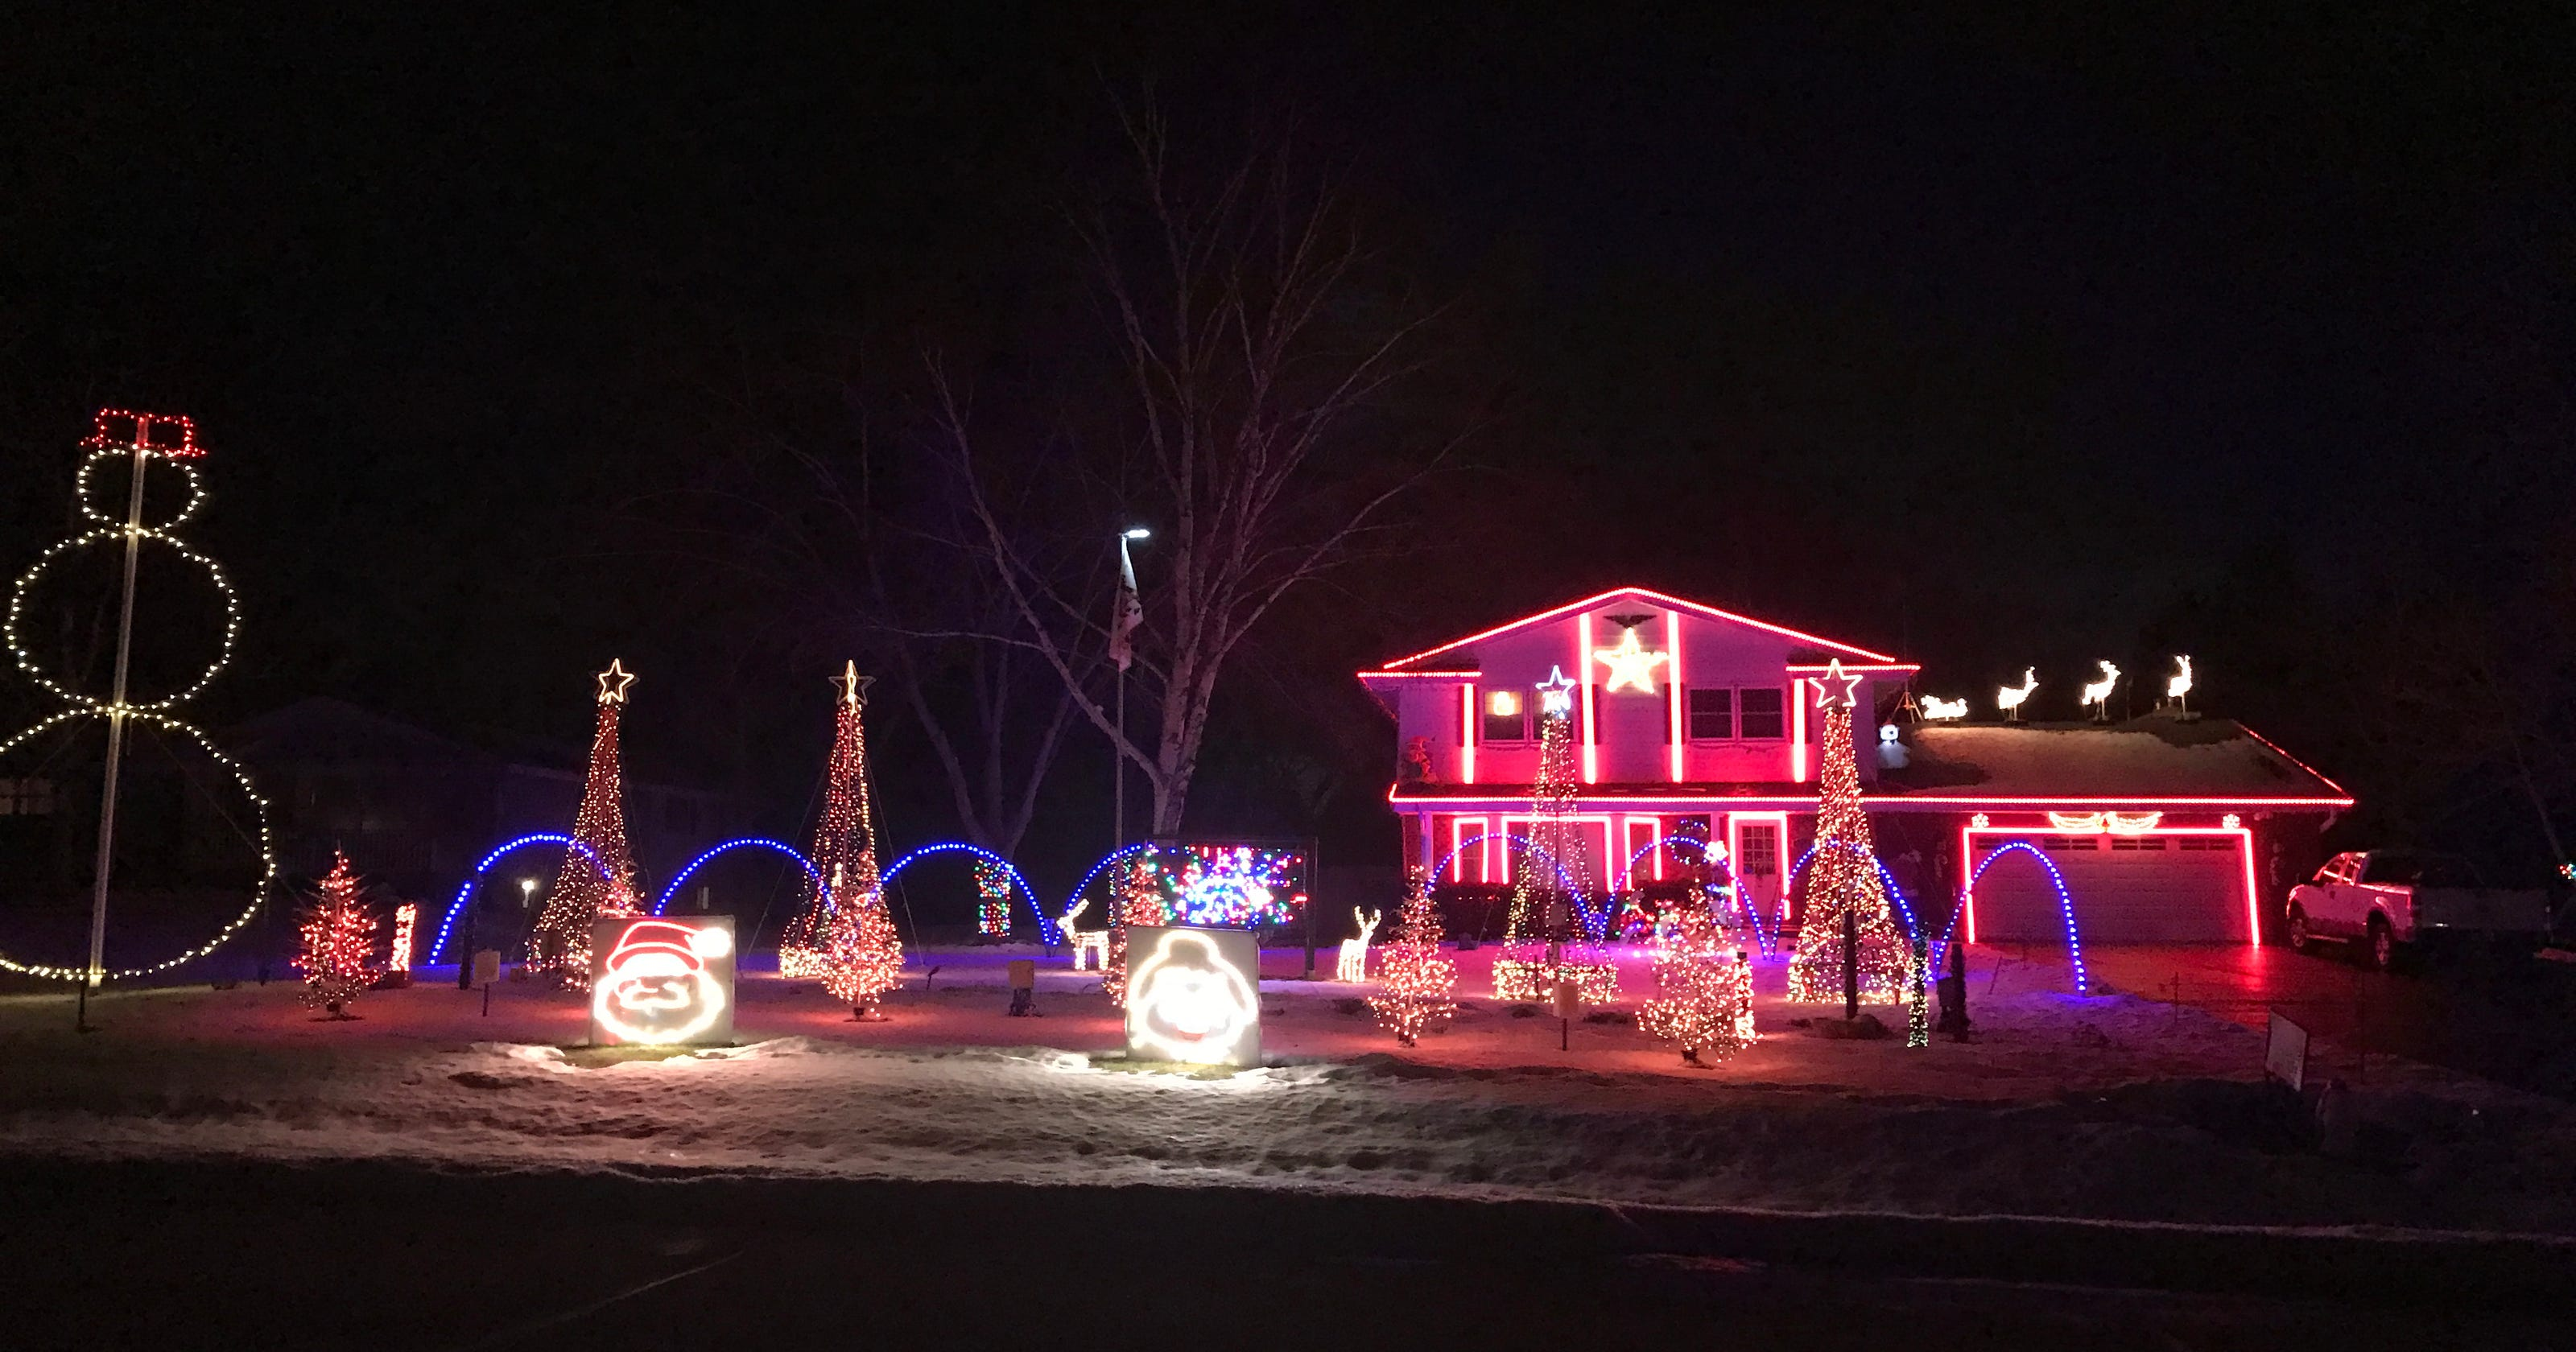 Christmas Lights Milwaukee.A Christmas Lights Enthusiast Gives 7 Tips On Getting Started